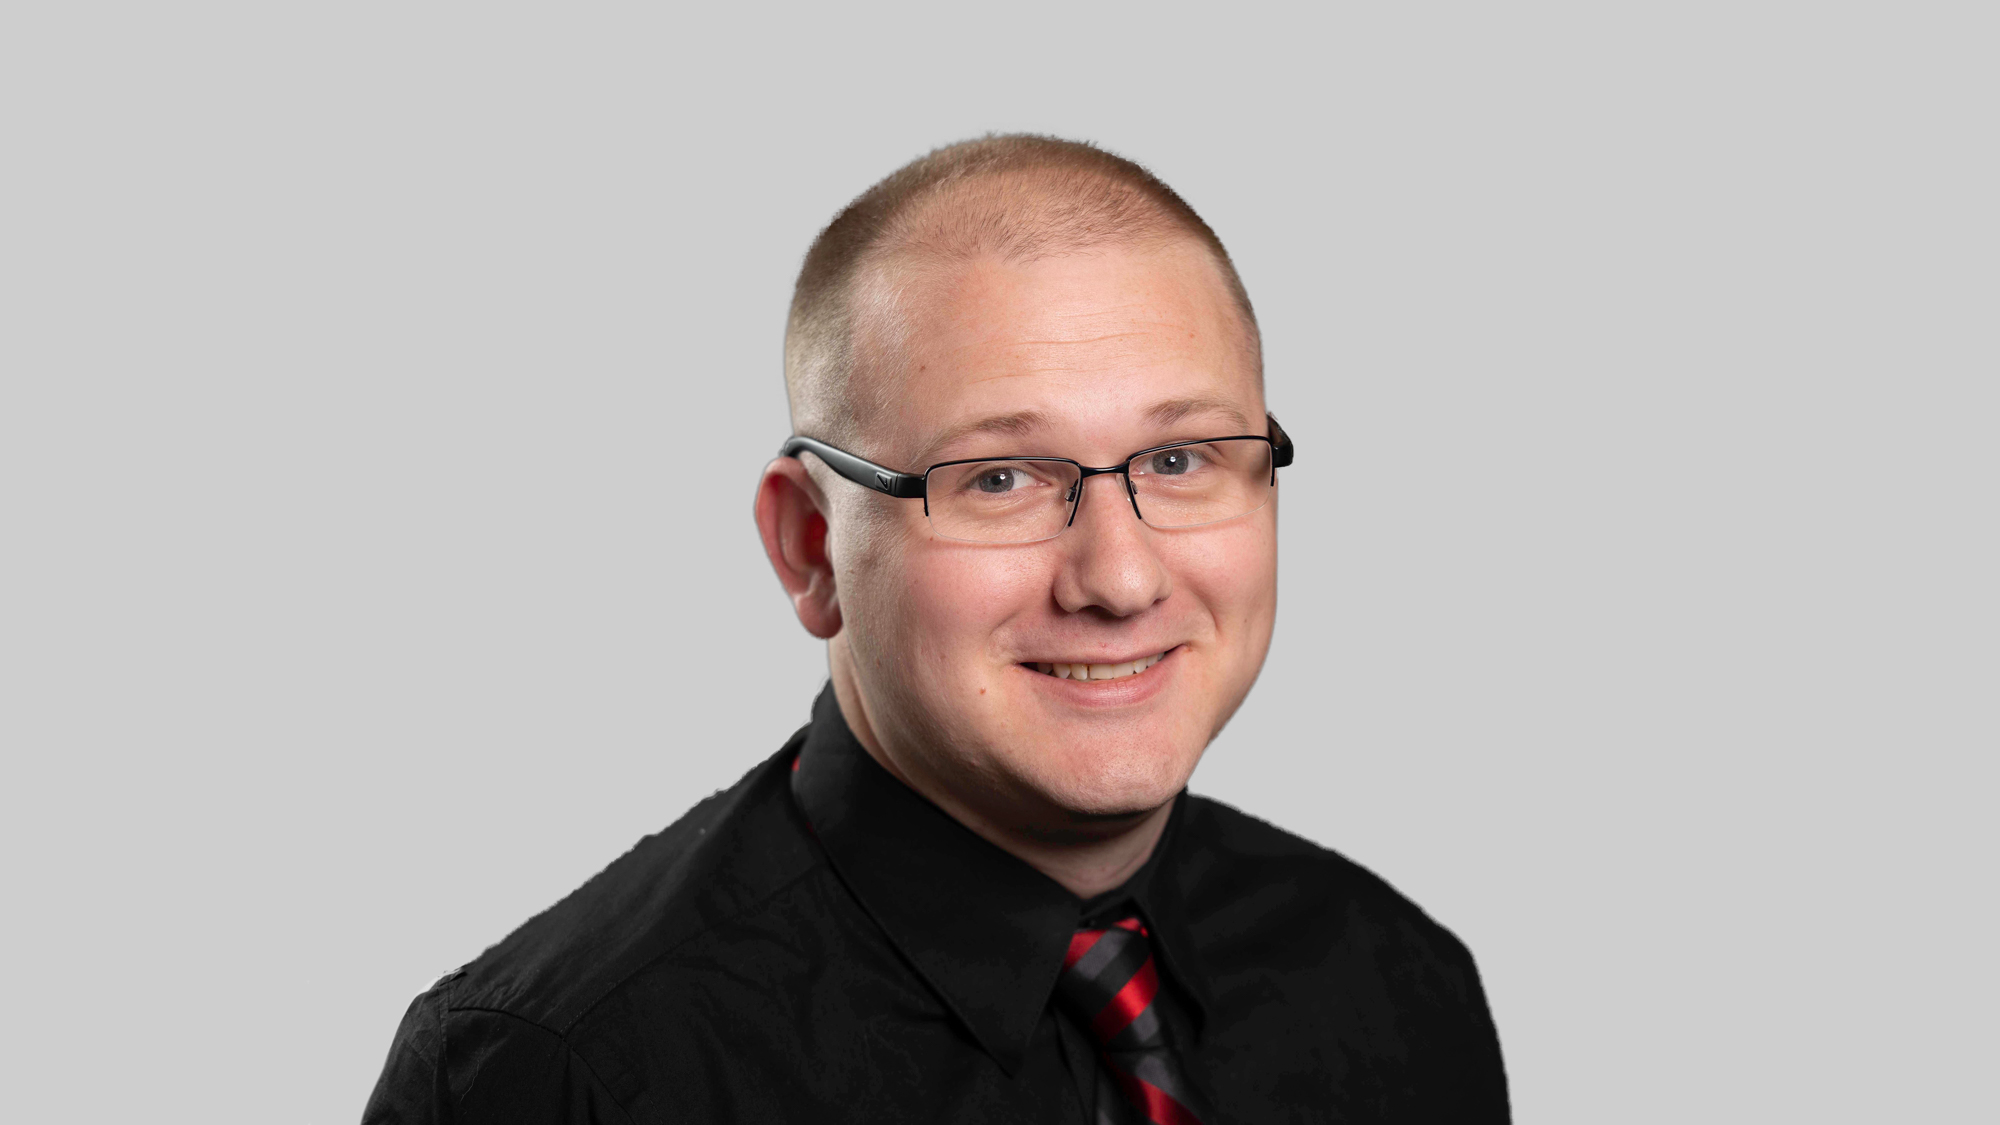 Tim Dillman Software Developer Headshot